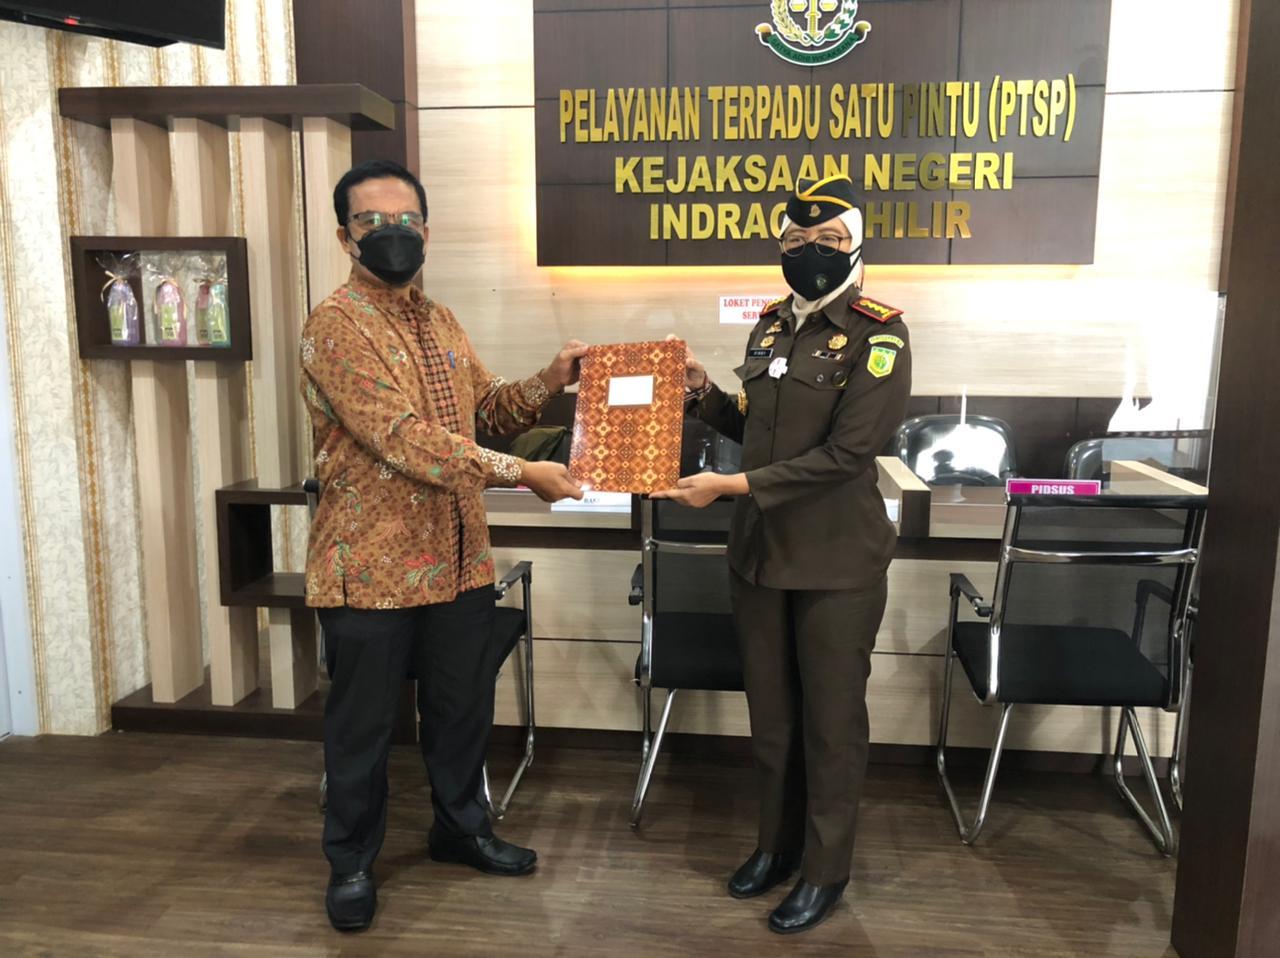 Kejaksaan Negeri Tembilahan Terima Hibah dari Sambu Group